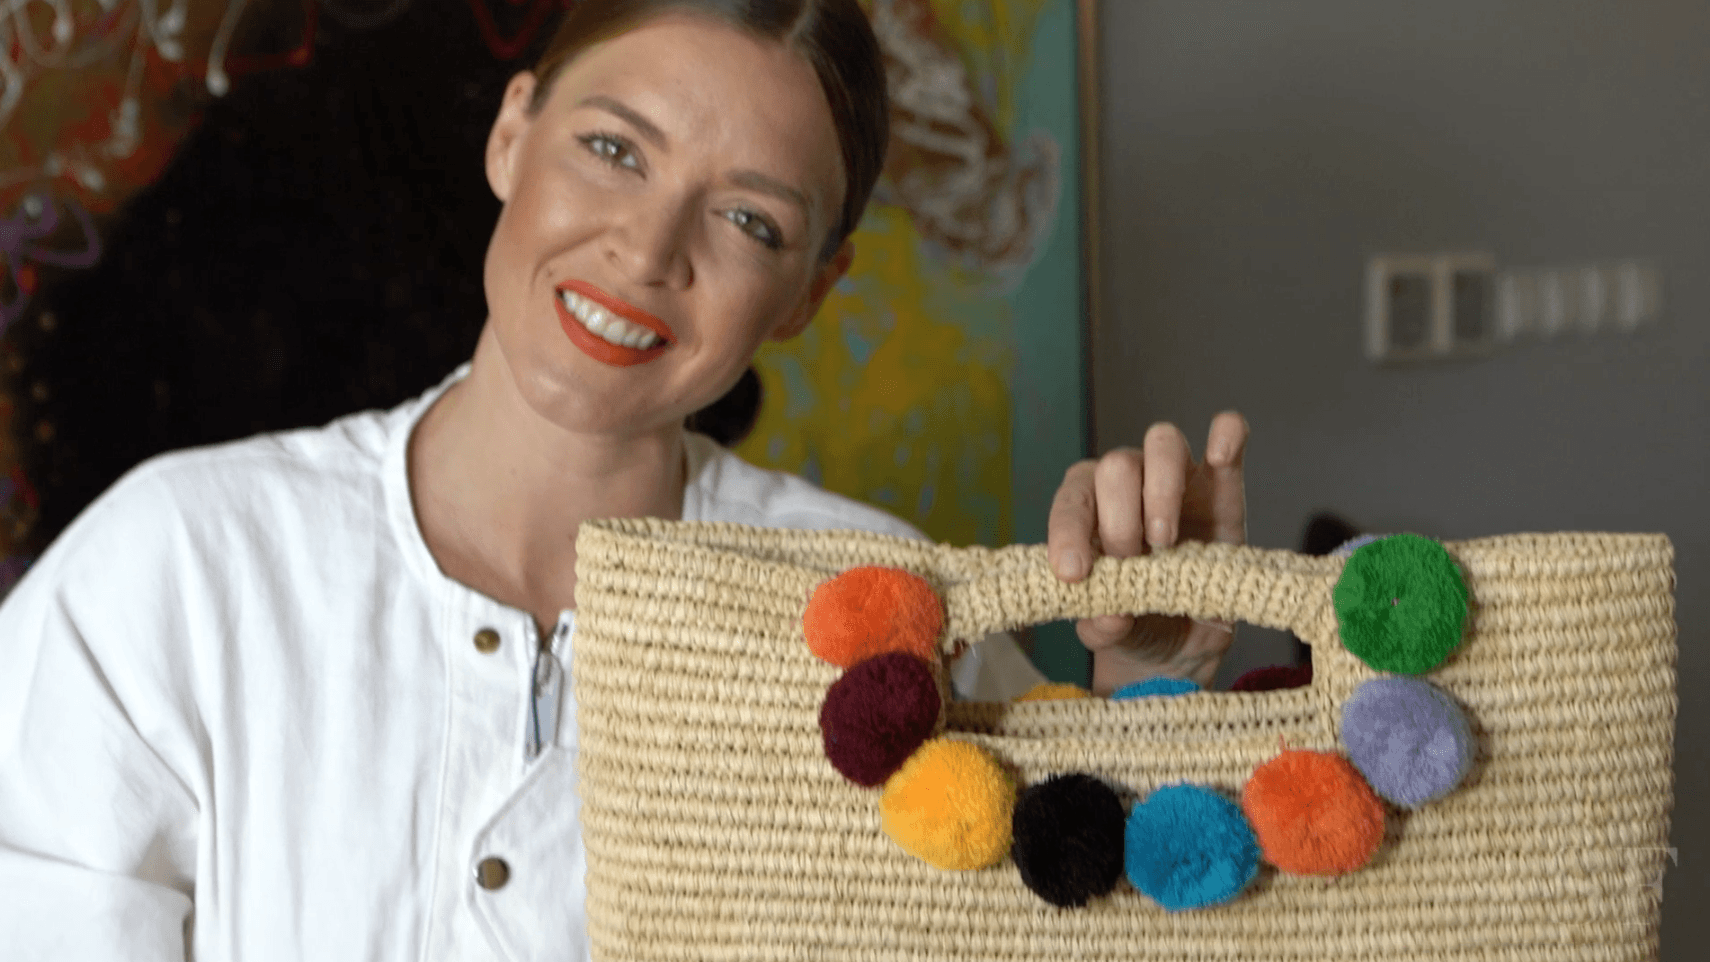 f749932c8 Natalia Shustova's Guide to Creating a Unique Bag | Savoir Flair ...